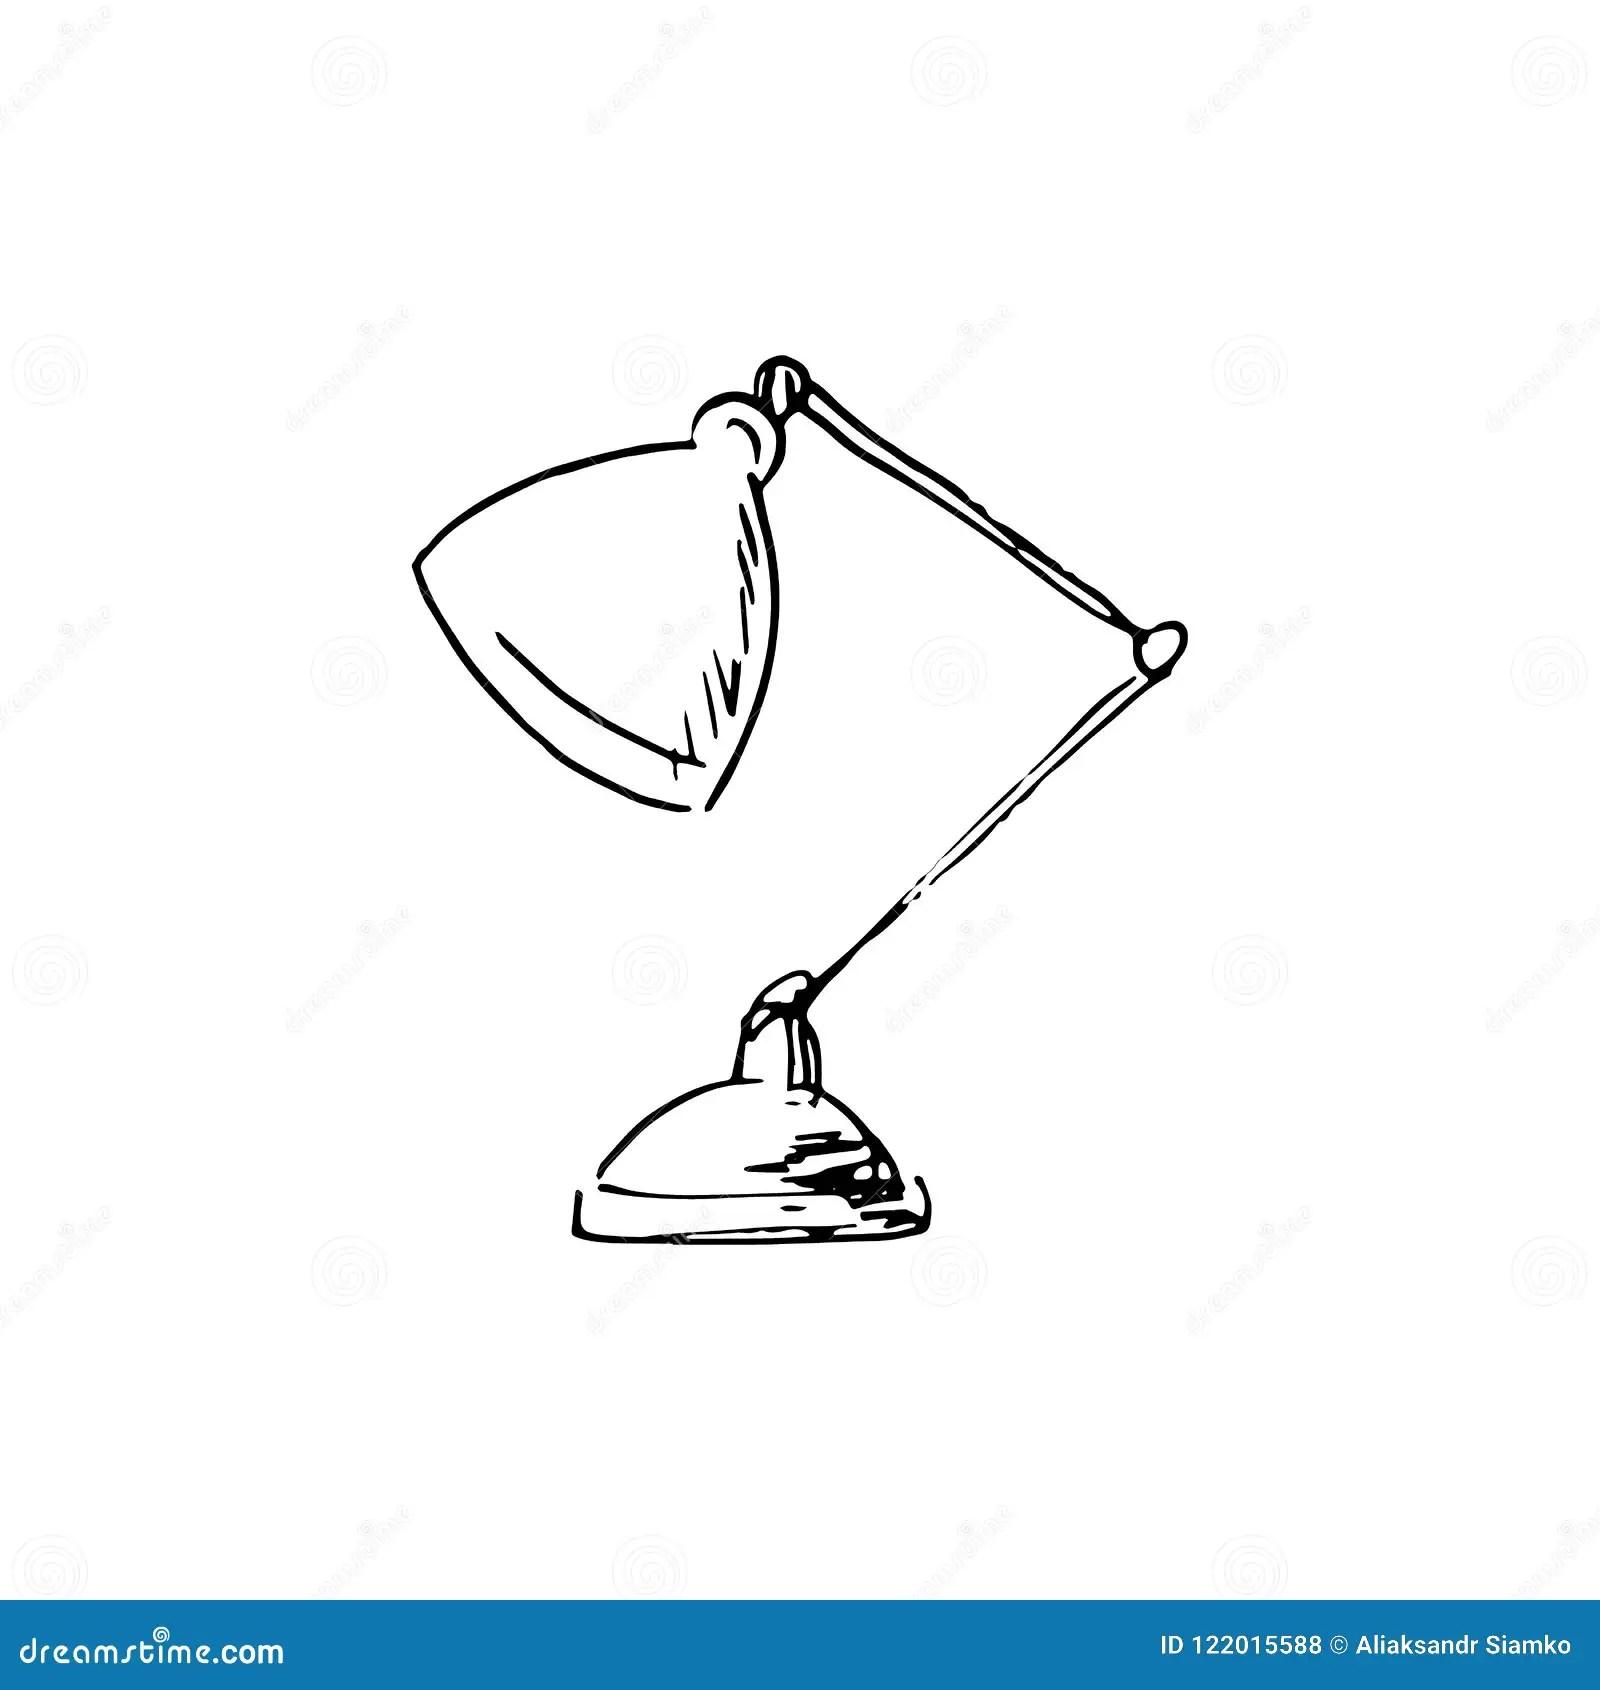 Wallpaper Blue Neon Sign | Wiring Diagram Database on neon sign frame, neon sign schematics, neon sign cabinet, neon sign body, neon sign troubleshooting, neon sign plug, neon sign lights, neon sign installation, neon sign tools, neon sign parts, neon sign accessories, neon sign repair, neon lights switch diagram, neon sign battery, neon sign tutorial, neon sign components diagram, neon sign wire, trailer light hook up diagram, neon sign transformer diagram, neon sign generator,